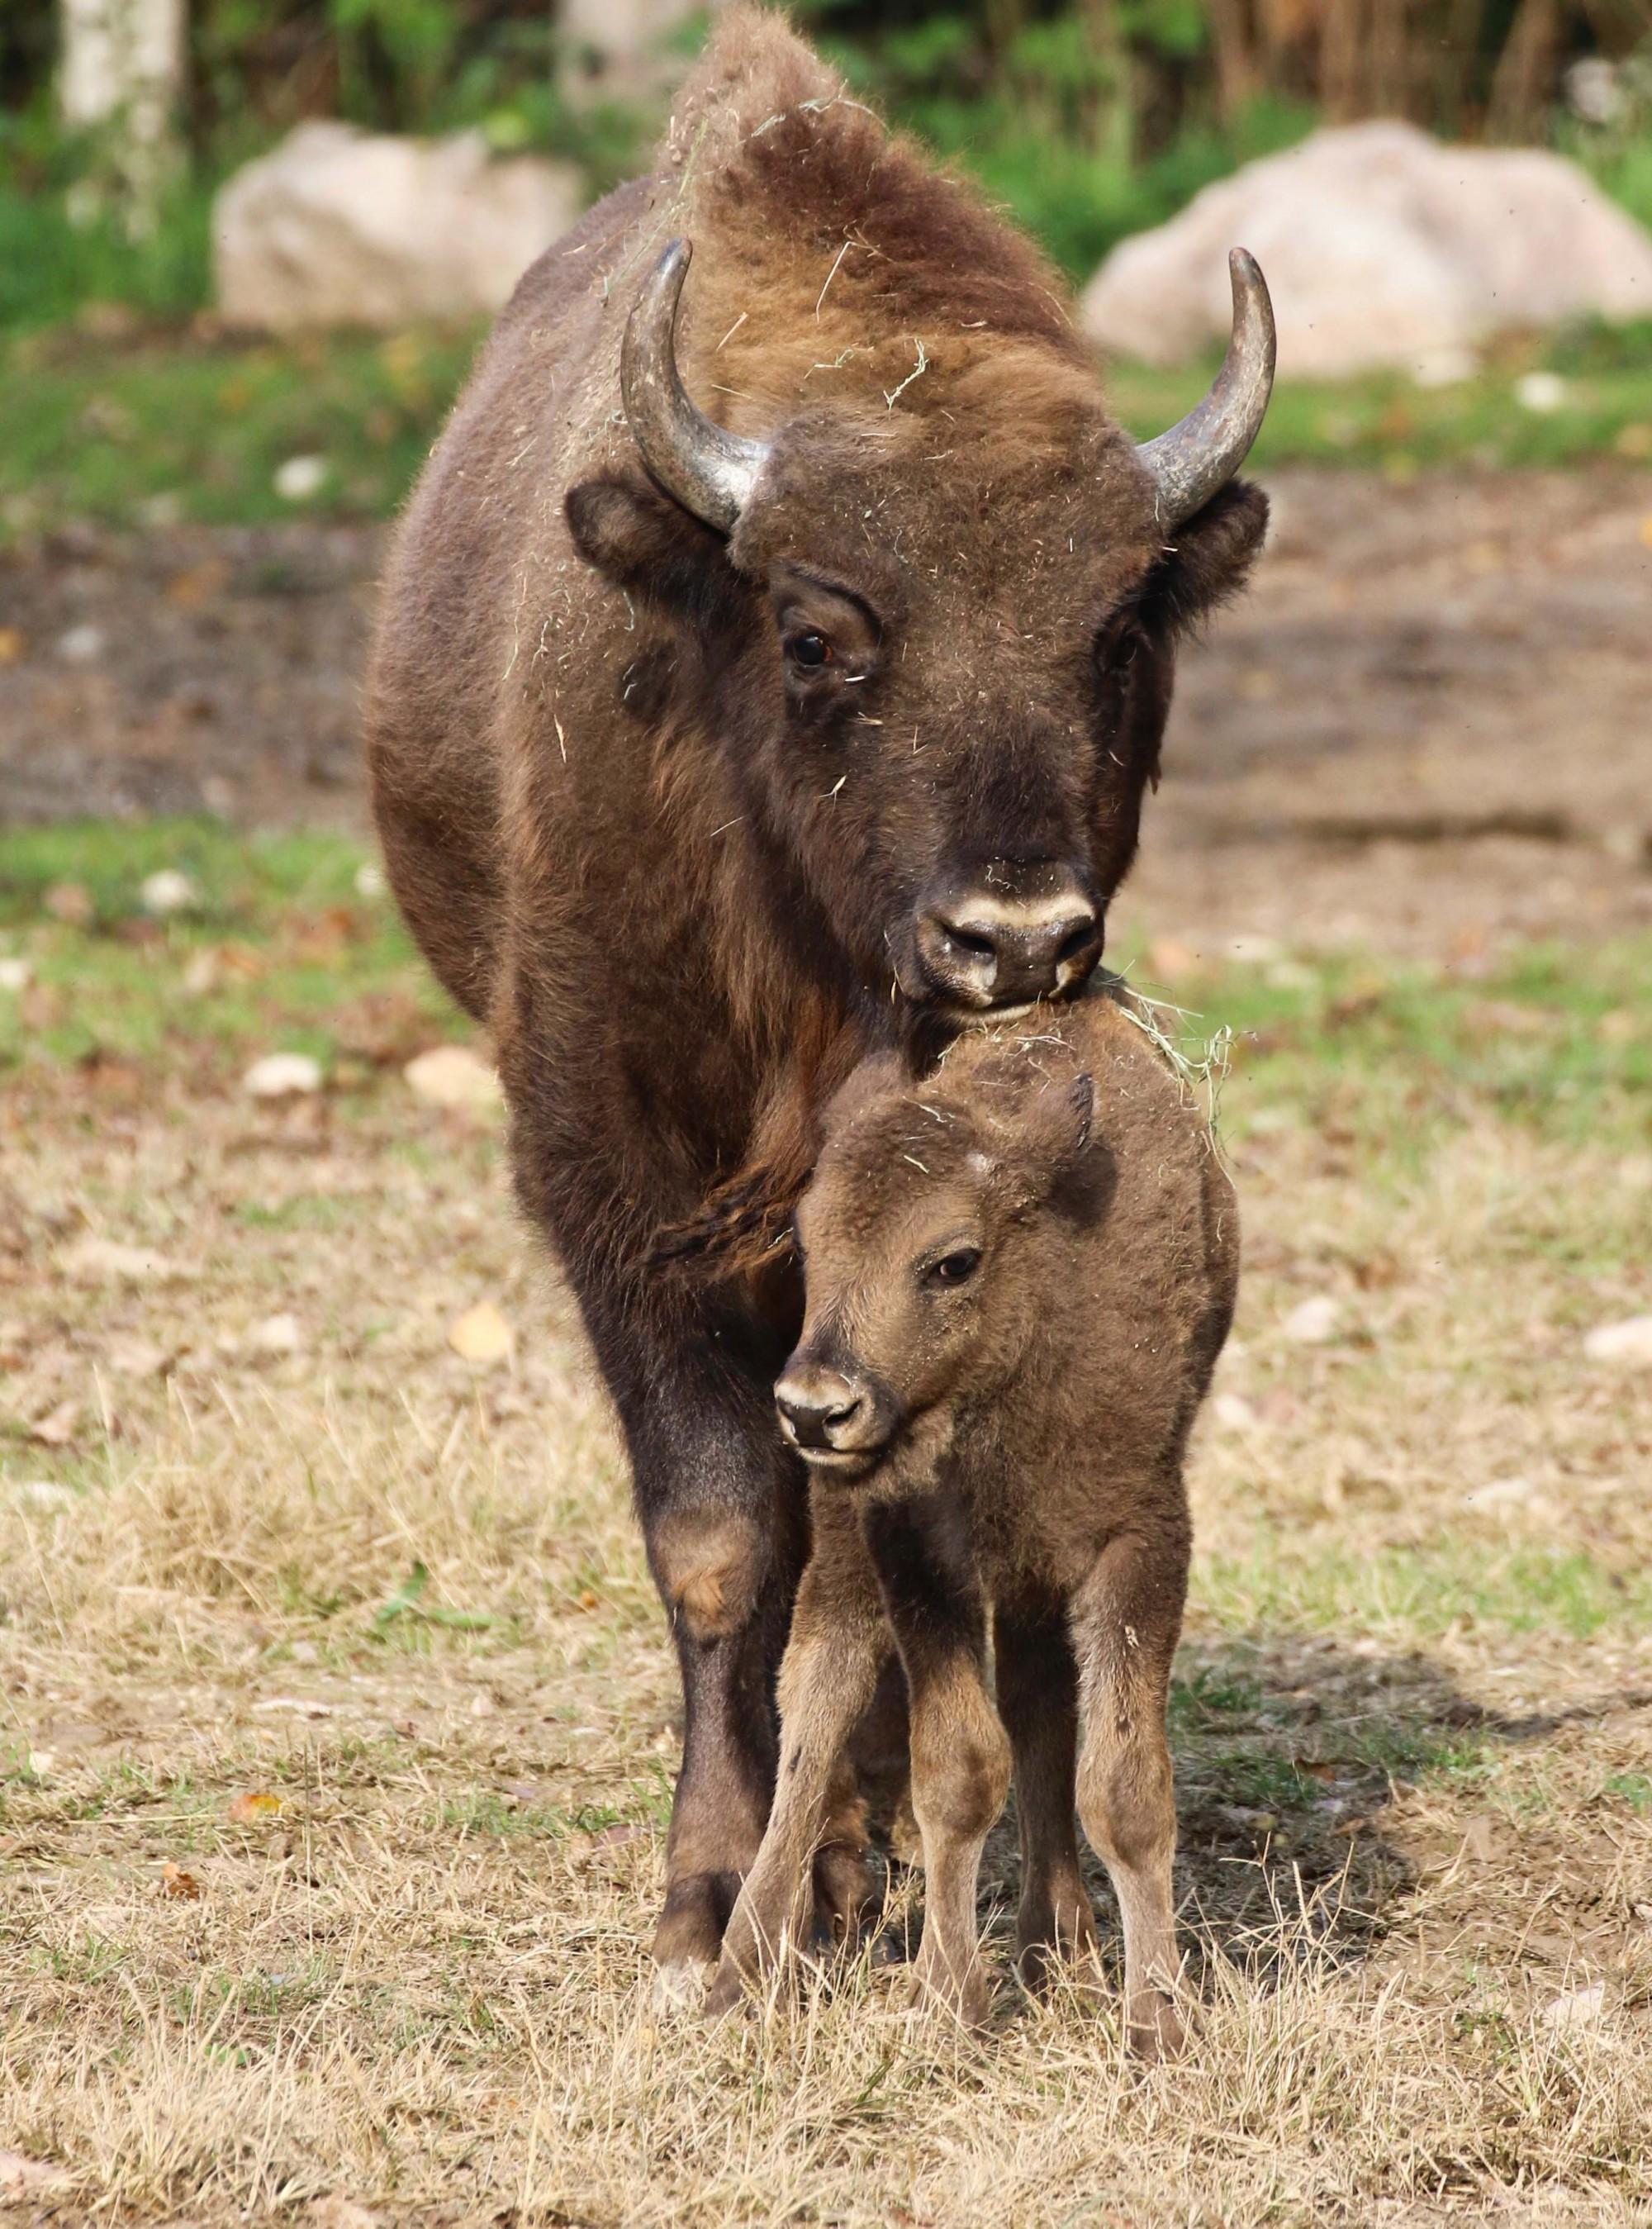 2017-giorgio-cortese-bisonte-europeo-cucciolo-40-zz-2.jpg